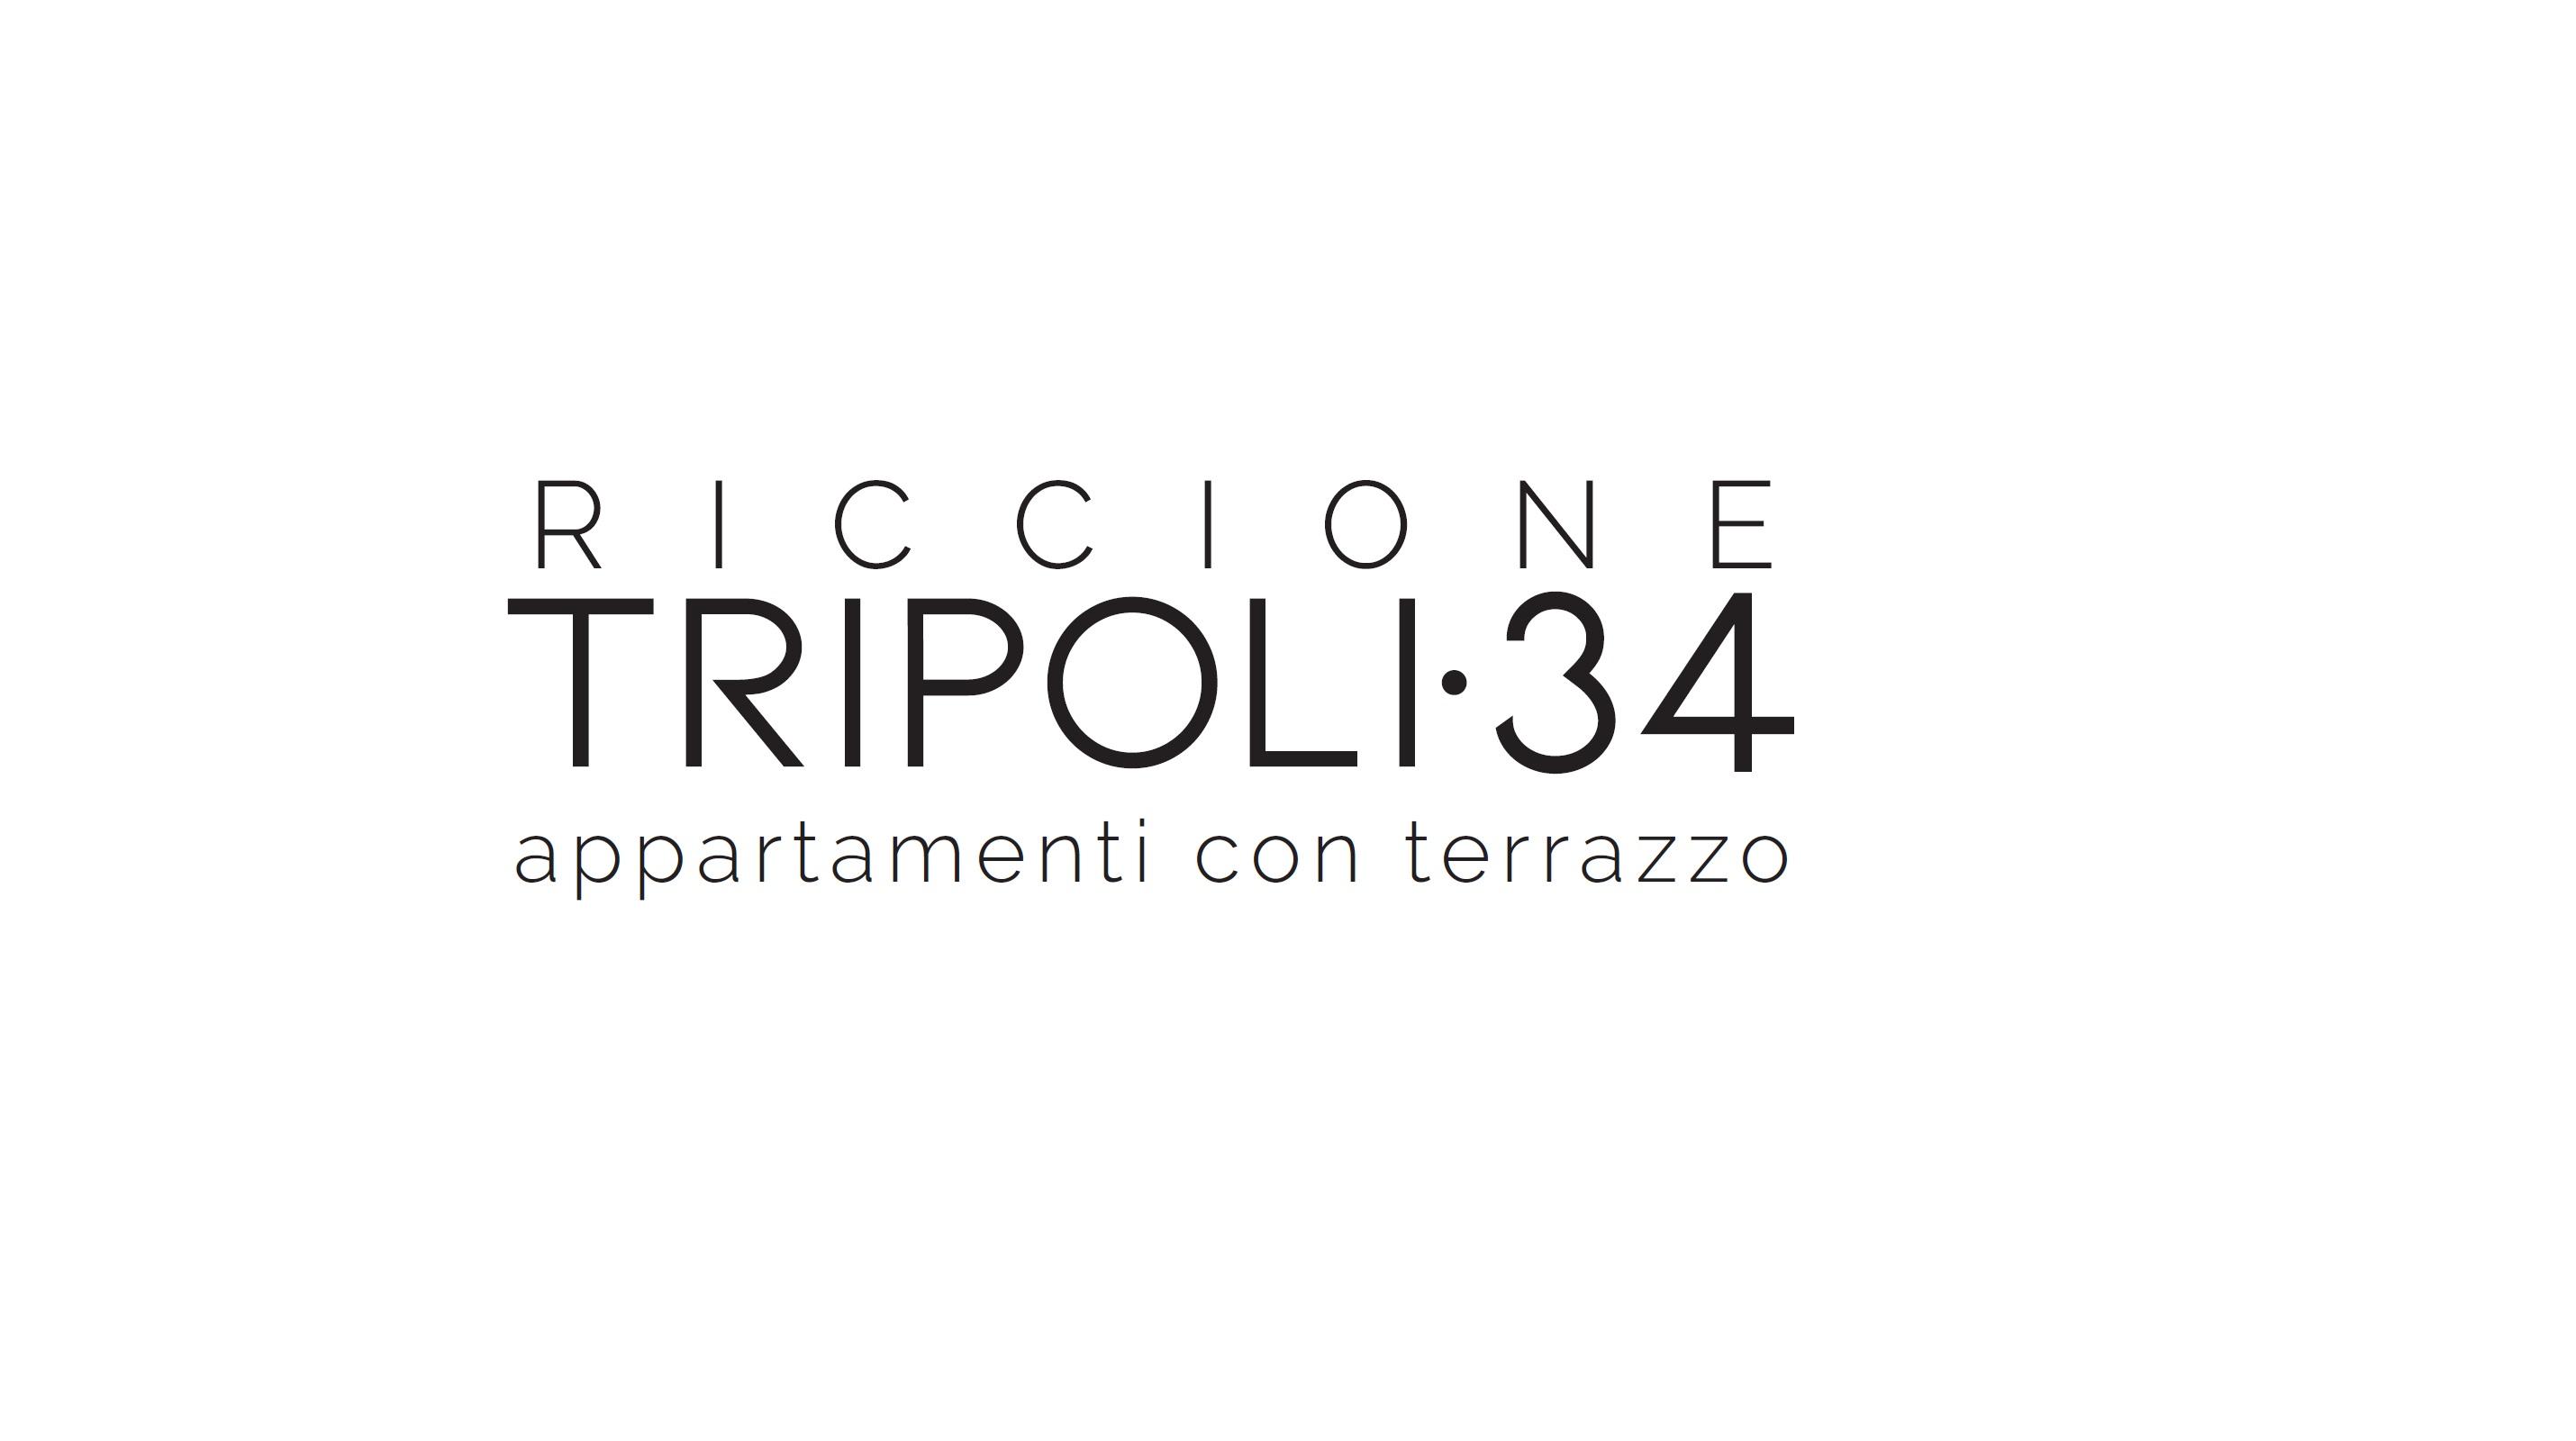 LOGO TRIPOLI34